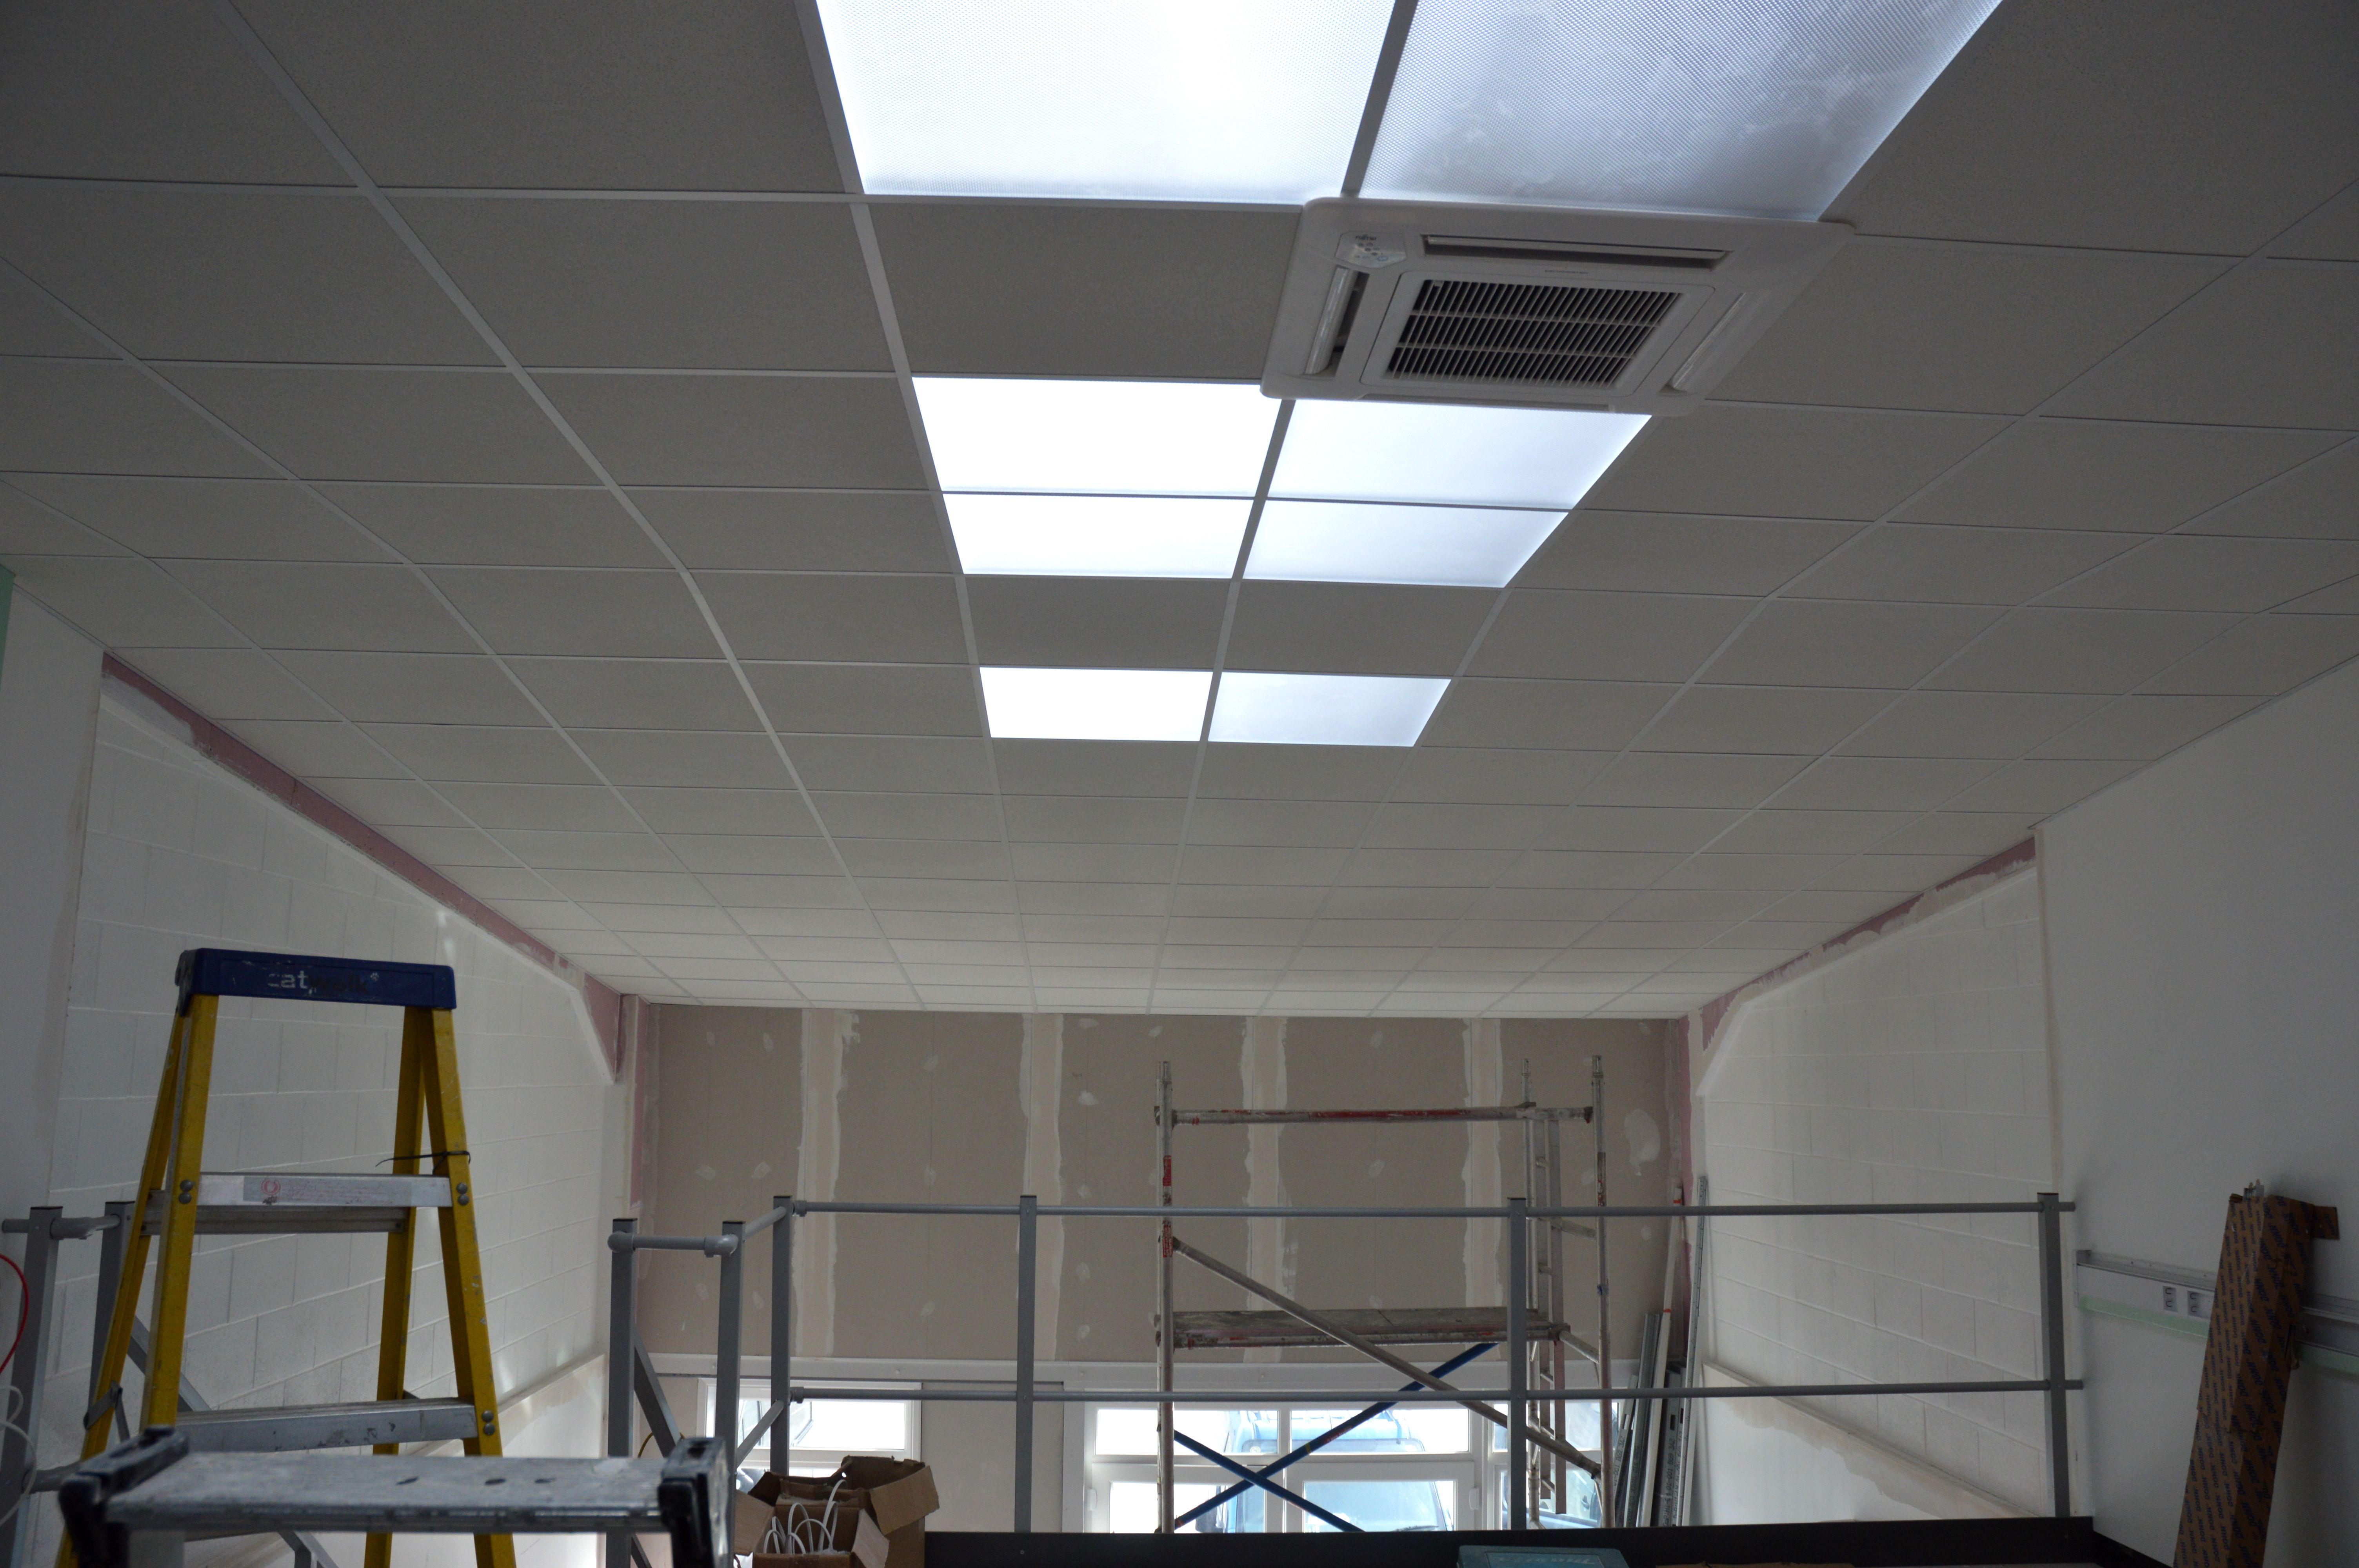 Office refurbishment - commercial interior